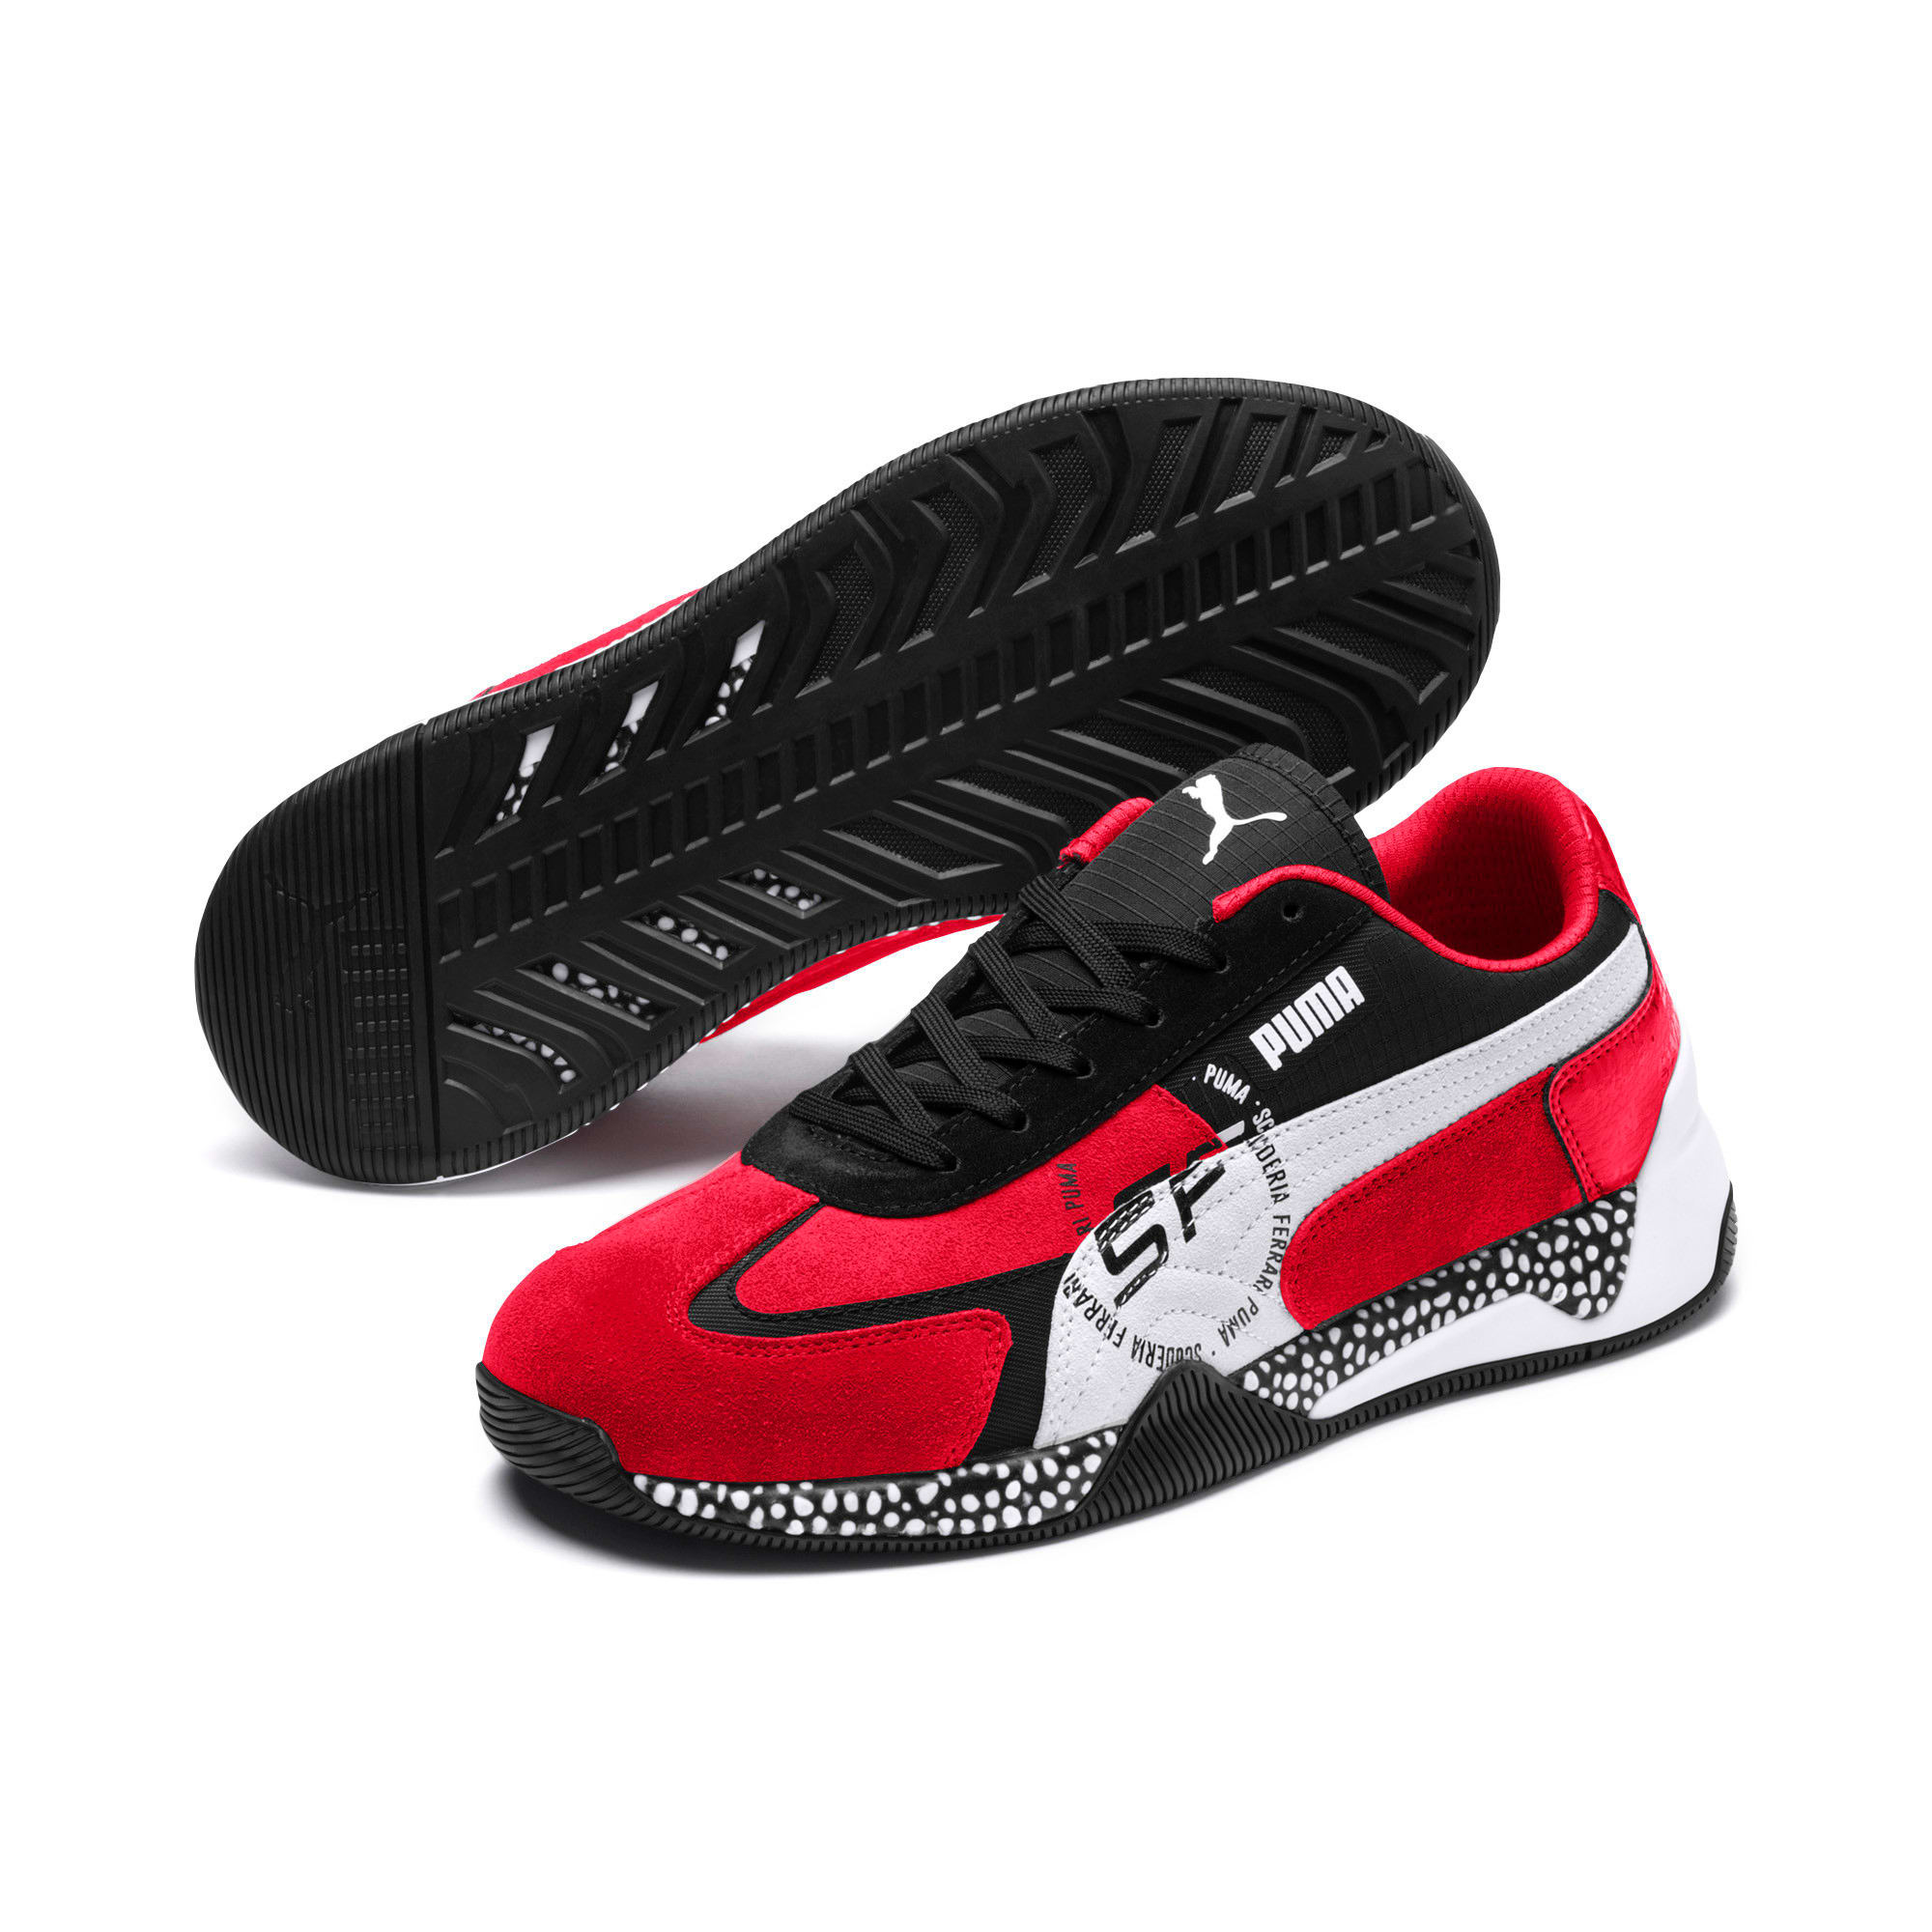 Thumbnail 3 of Ferrari Speed HYBRID Men's Trainers, Rosso Corsa-White-Black, medium